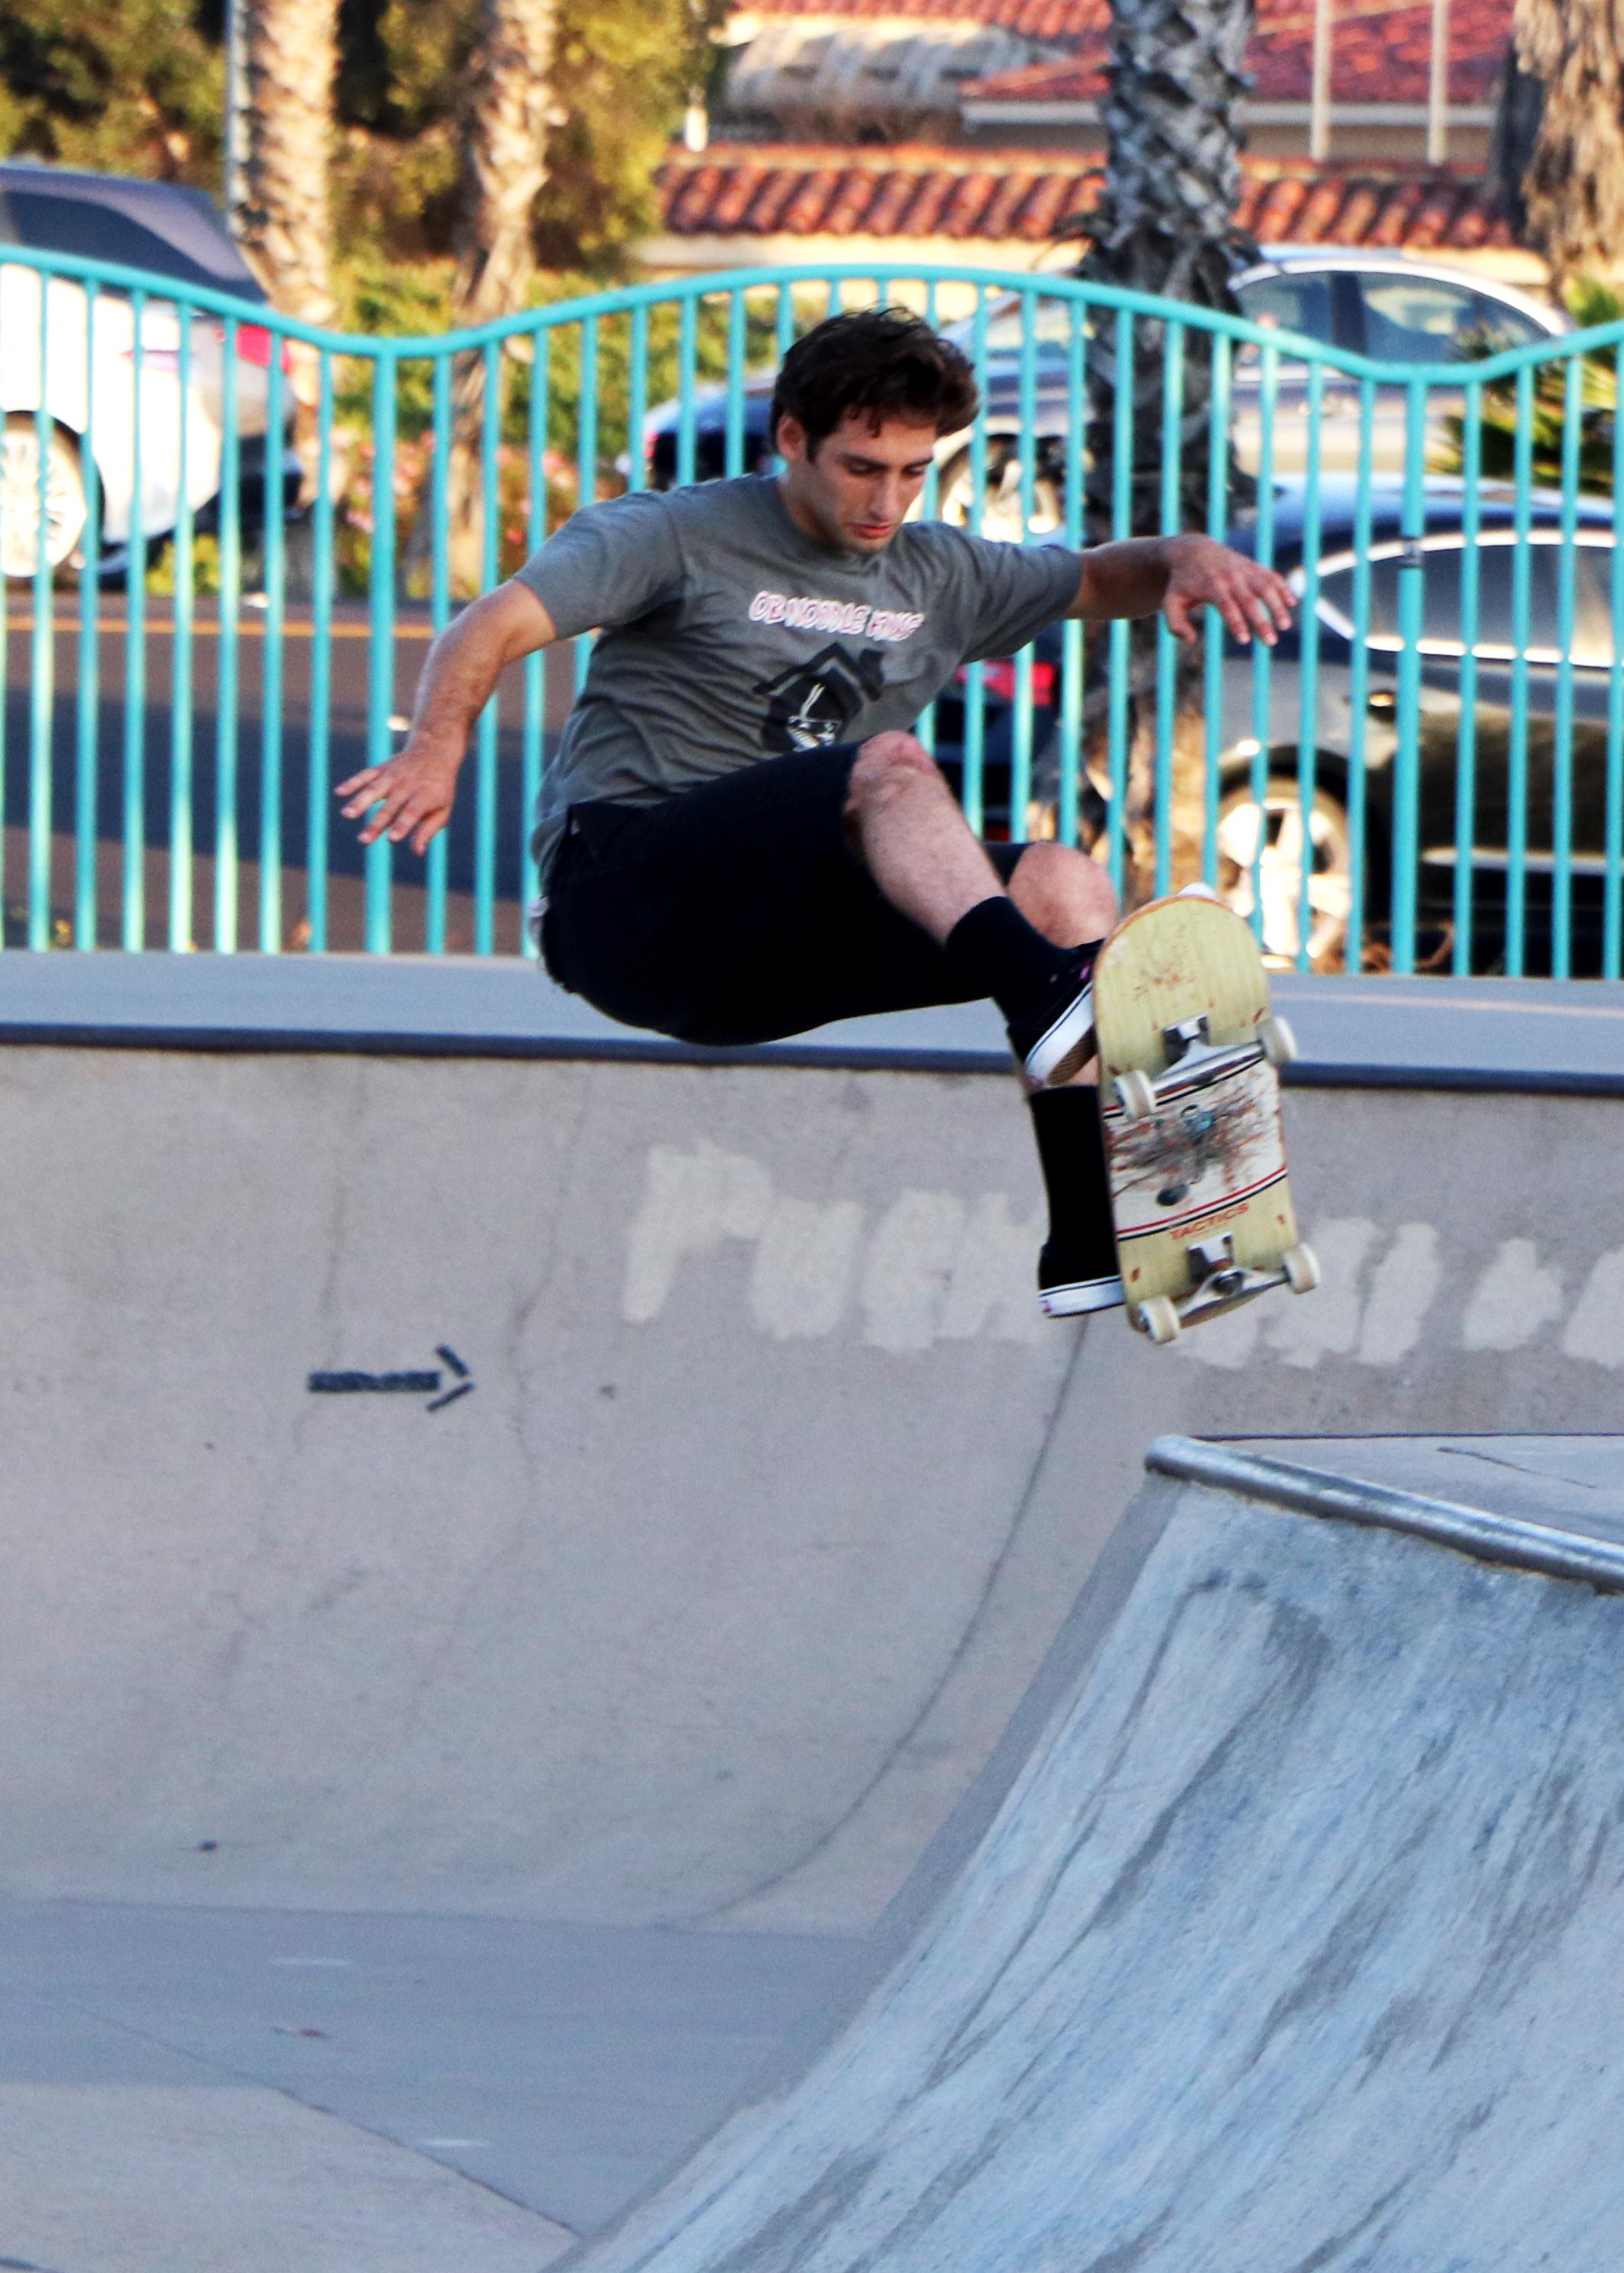 Skateboarder at Robb Field Skate Park in San Diego